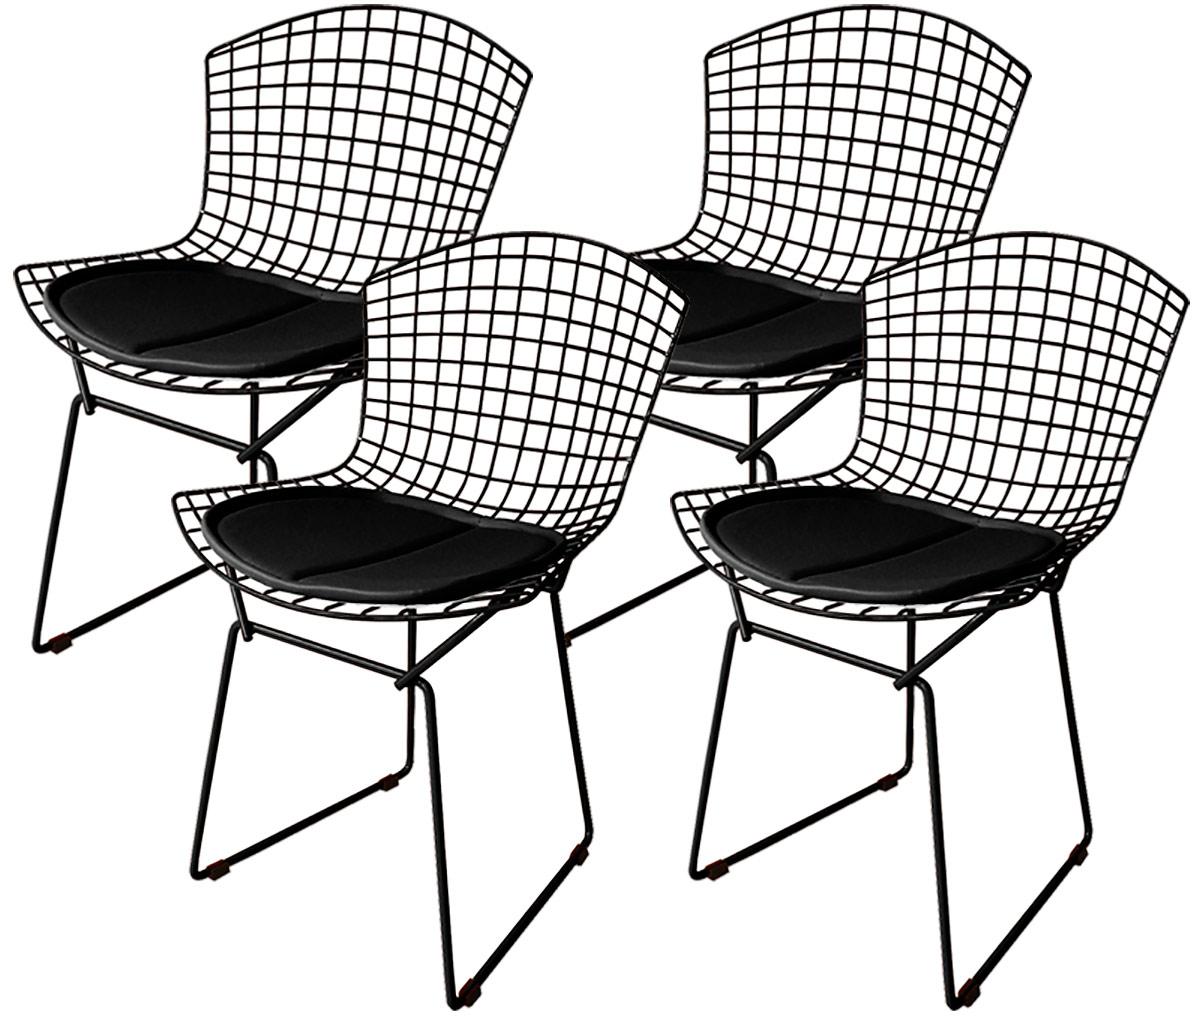 Kit 4x Cadeira Bertoia Tradicional Preta - Ponta de Estoque